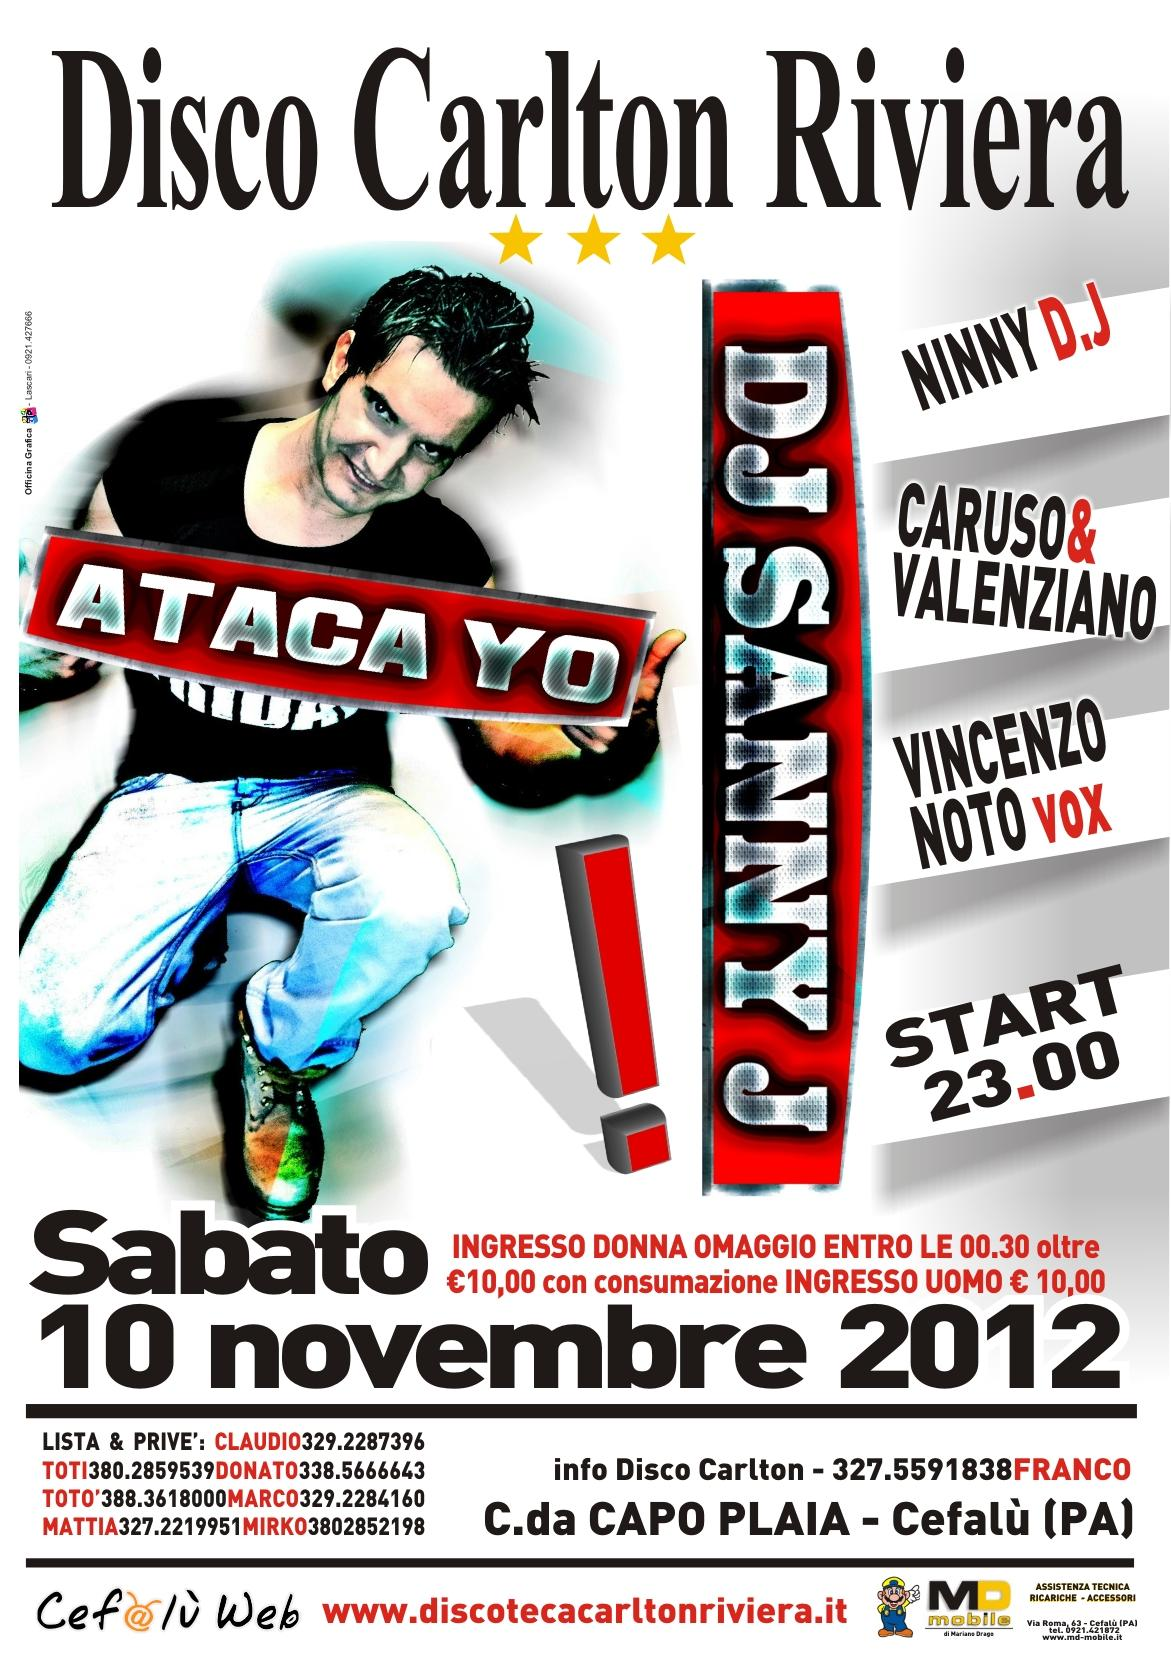 Discoteca Carlton Riviera: 3 Novembre 2012 - Dj Sanny J (Alegria)